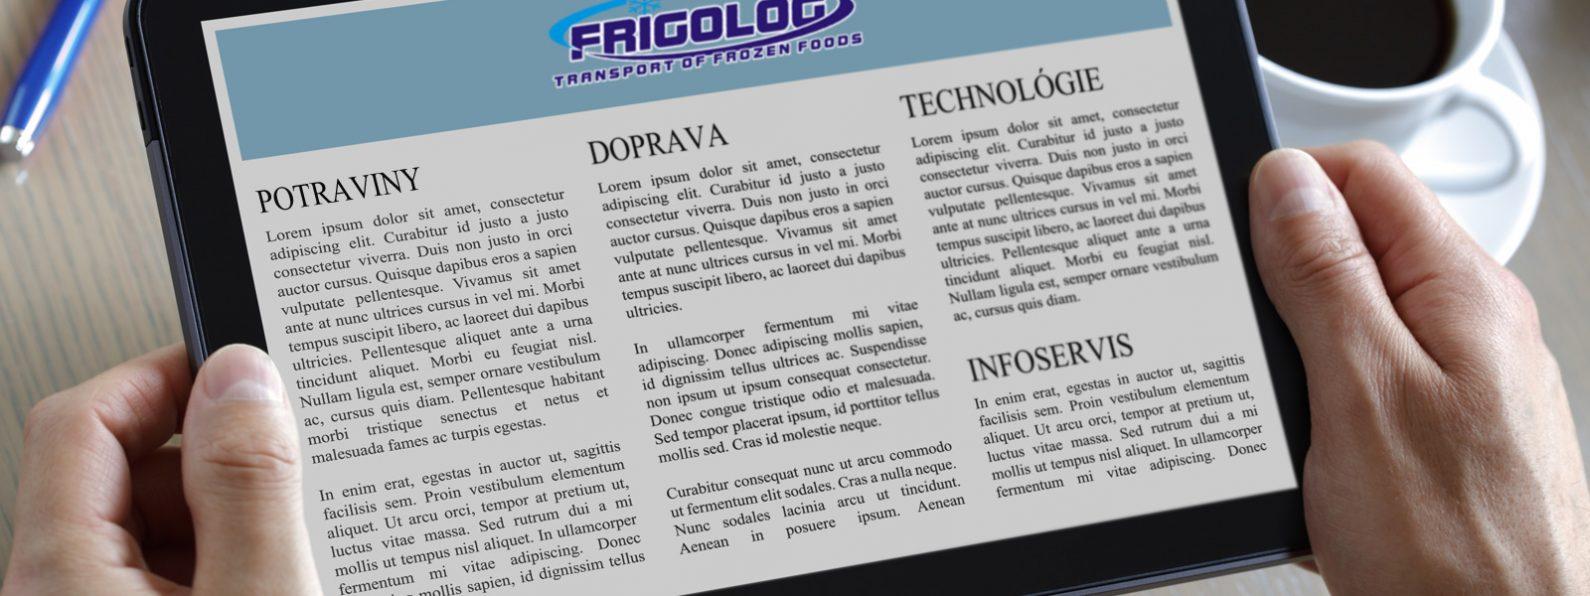 Infoservis - Frigolog